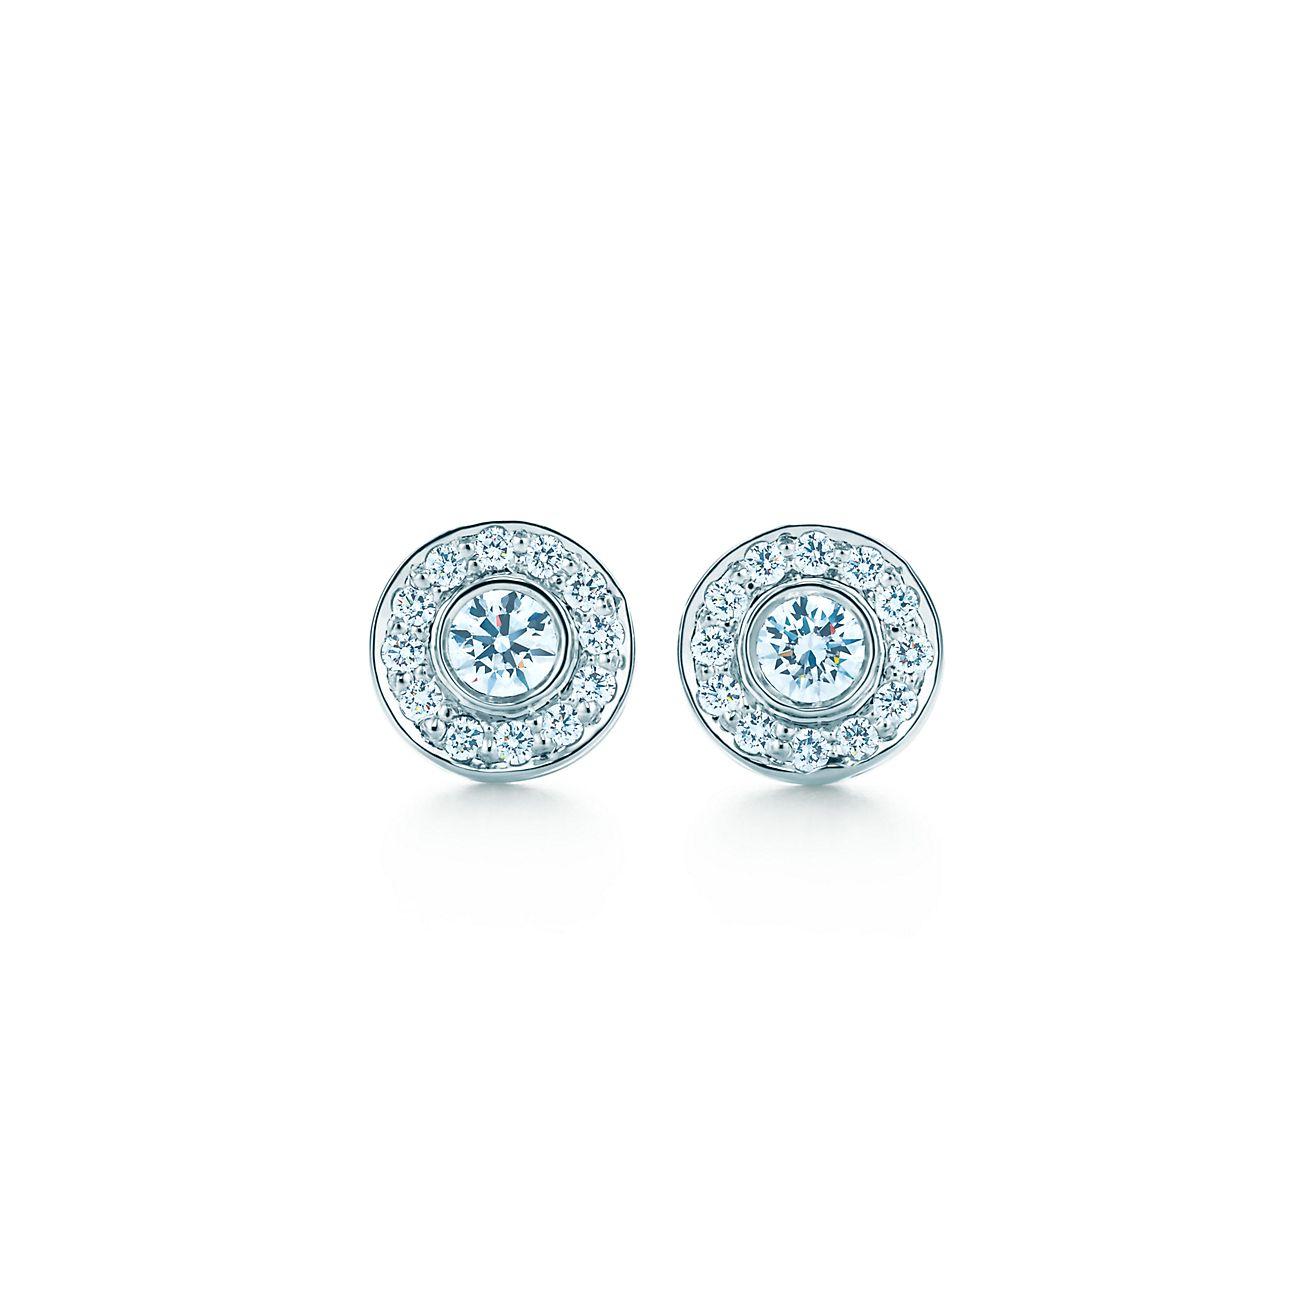 Tiffany Circlet Earrings